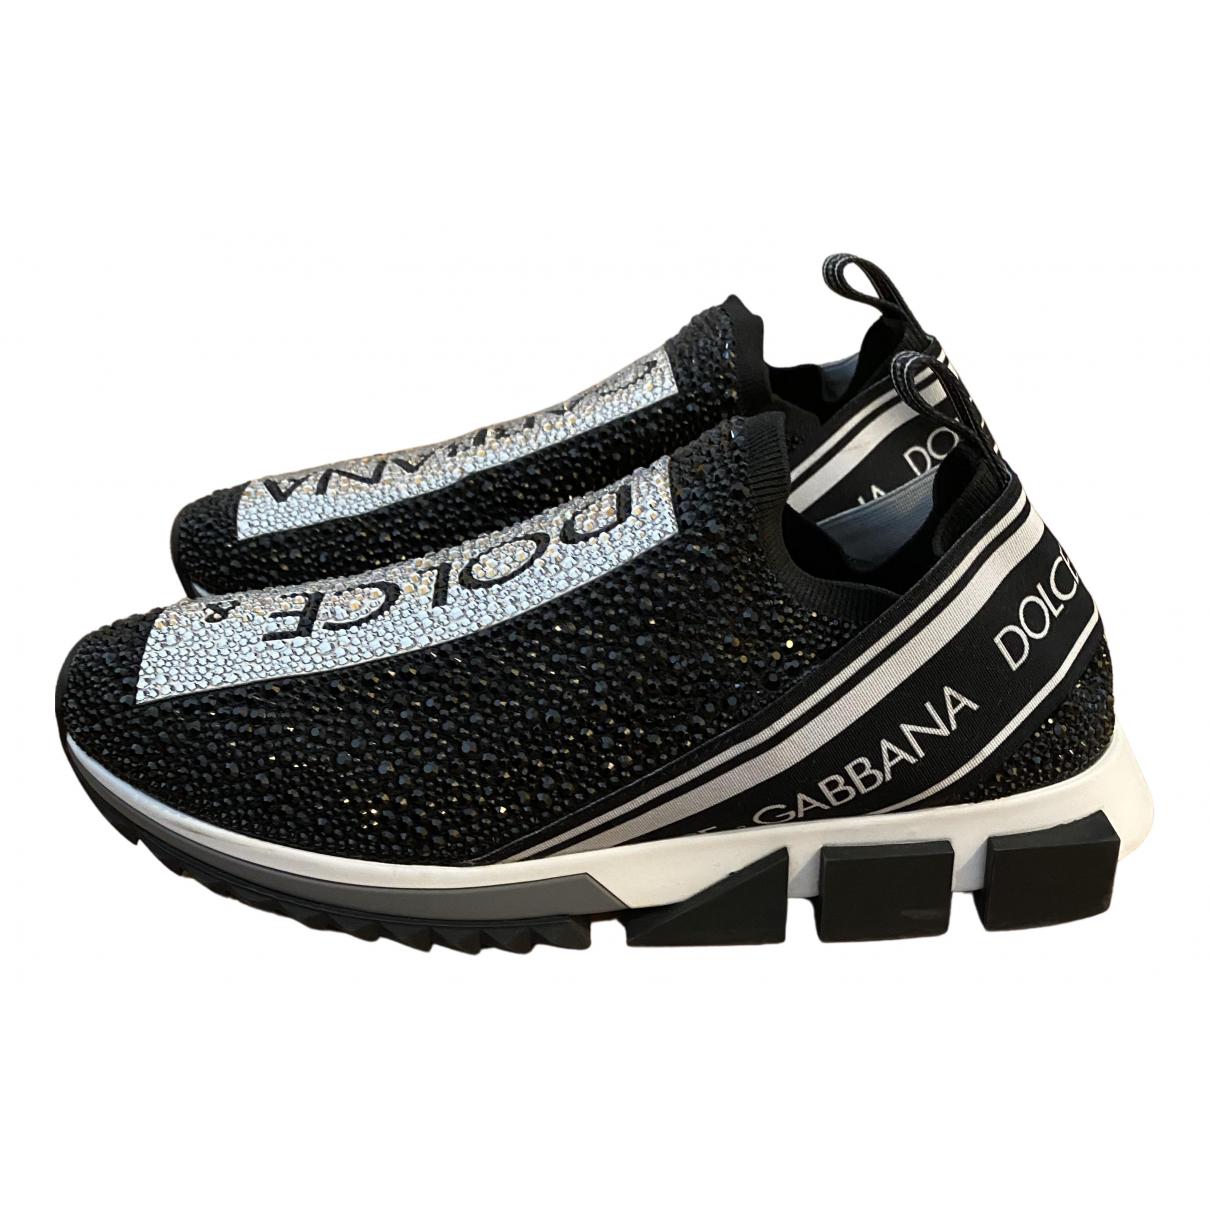 Dolce & Gabbana Sorrento Sneakers in  Schwarz Mit Pailletten